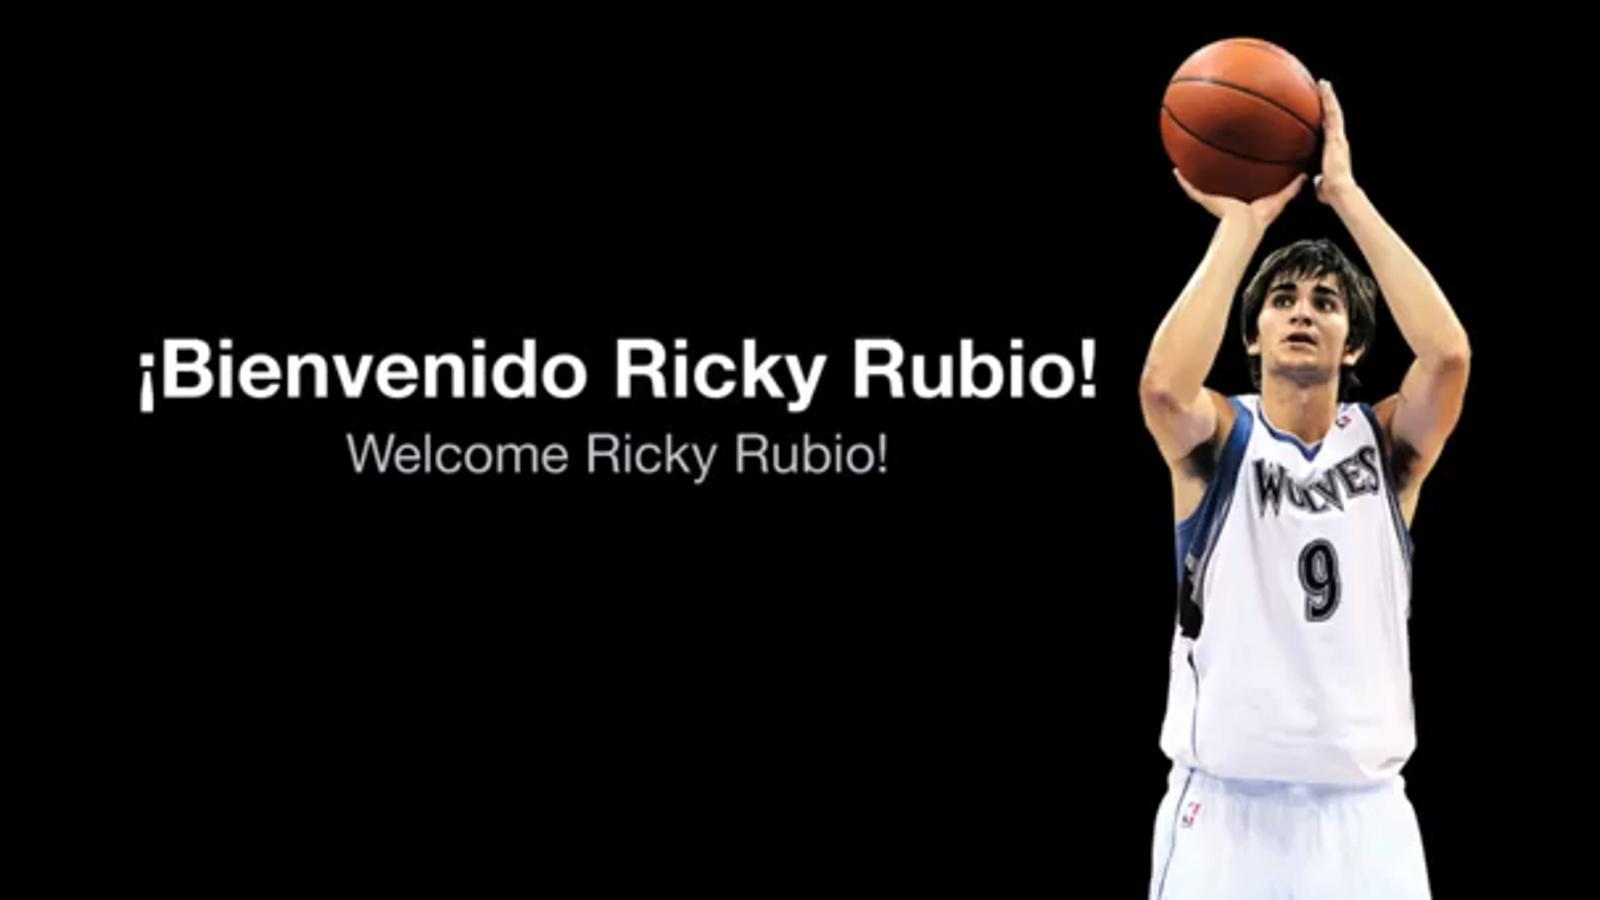 Welcome Ricky Rubio!